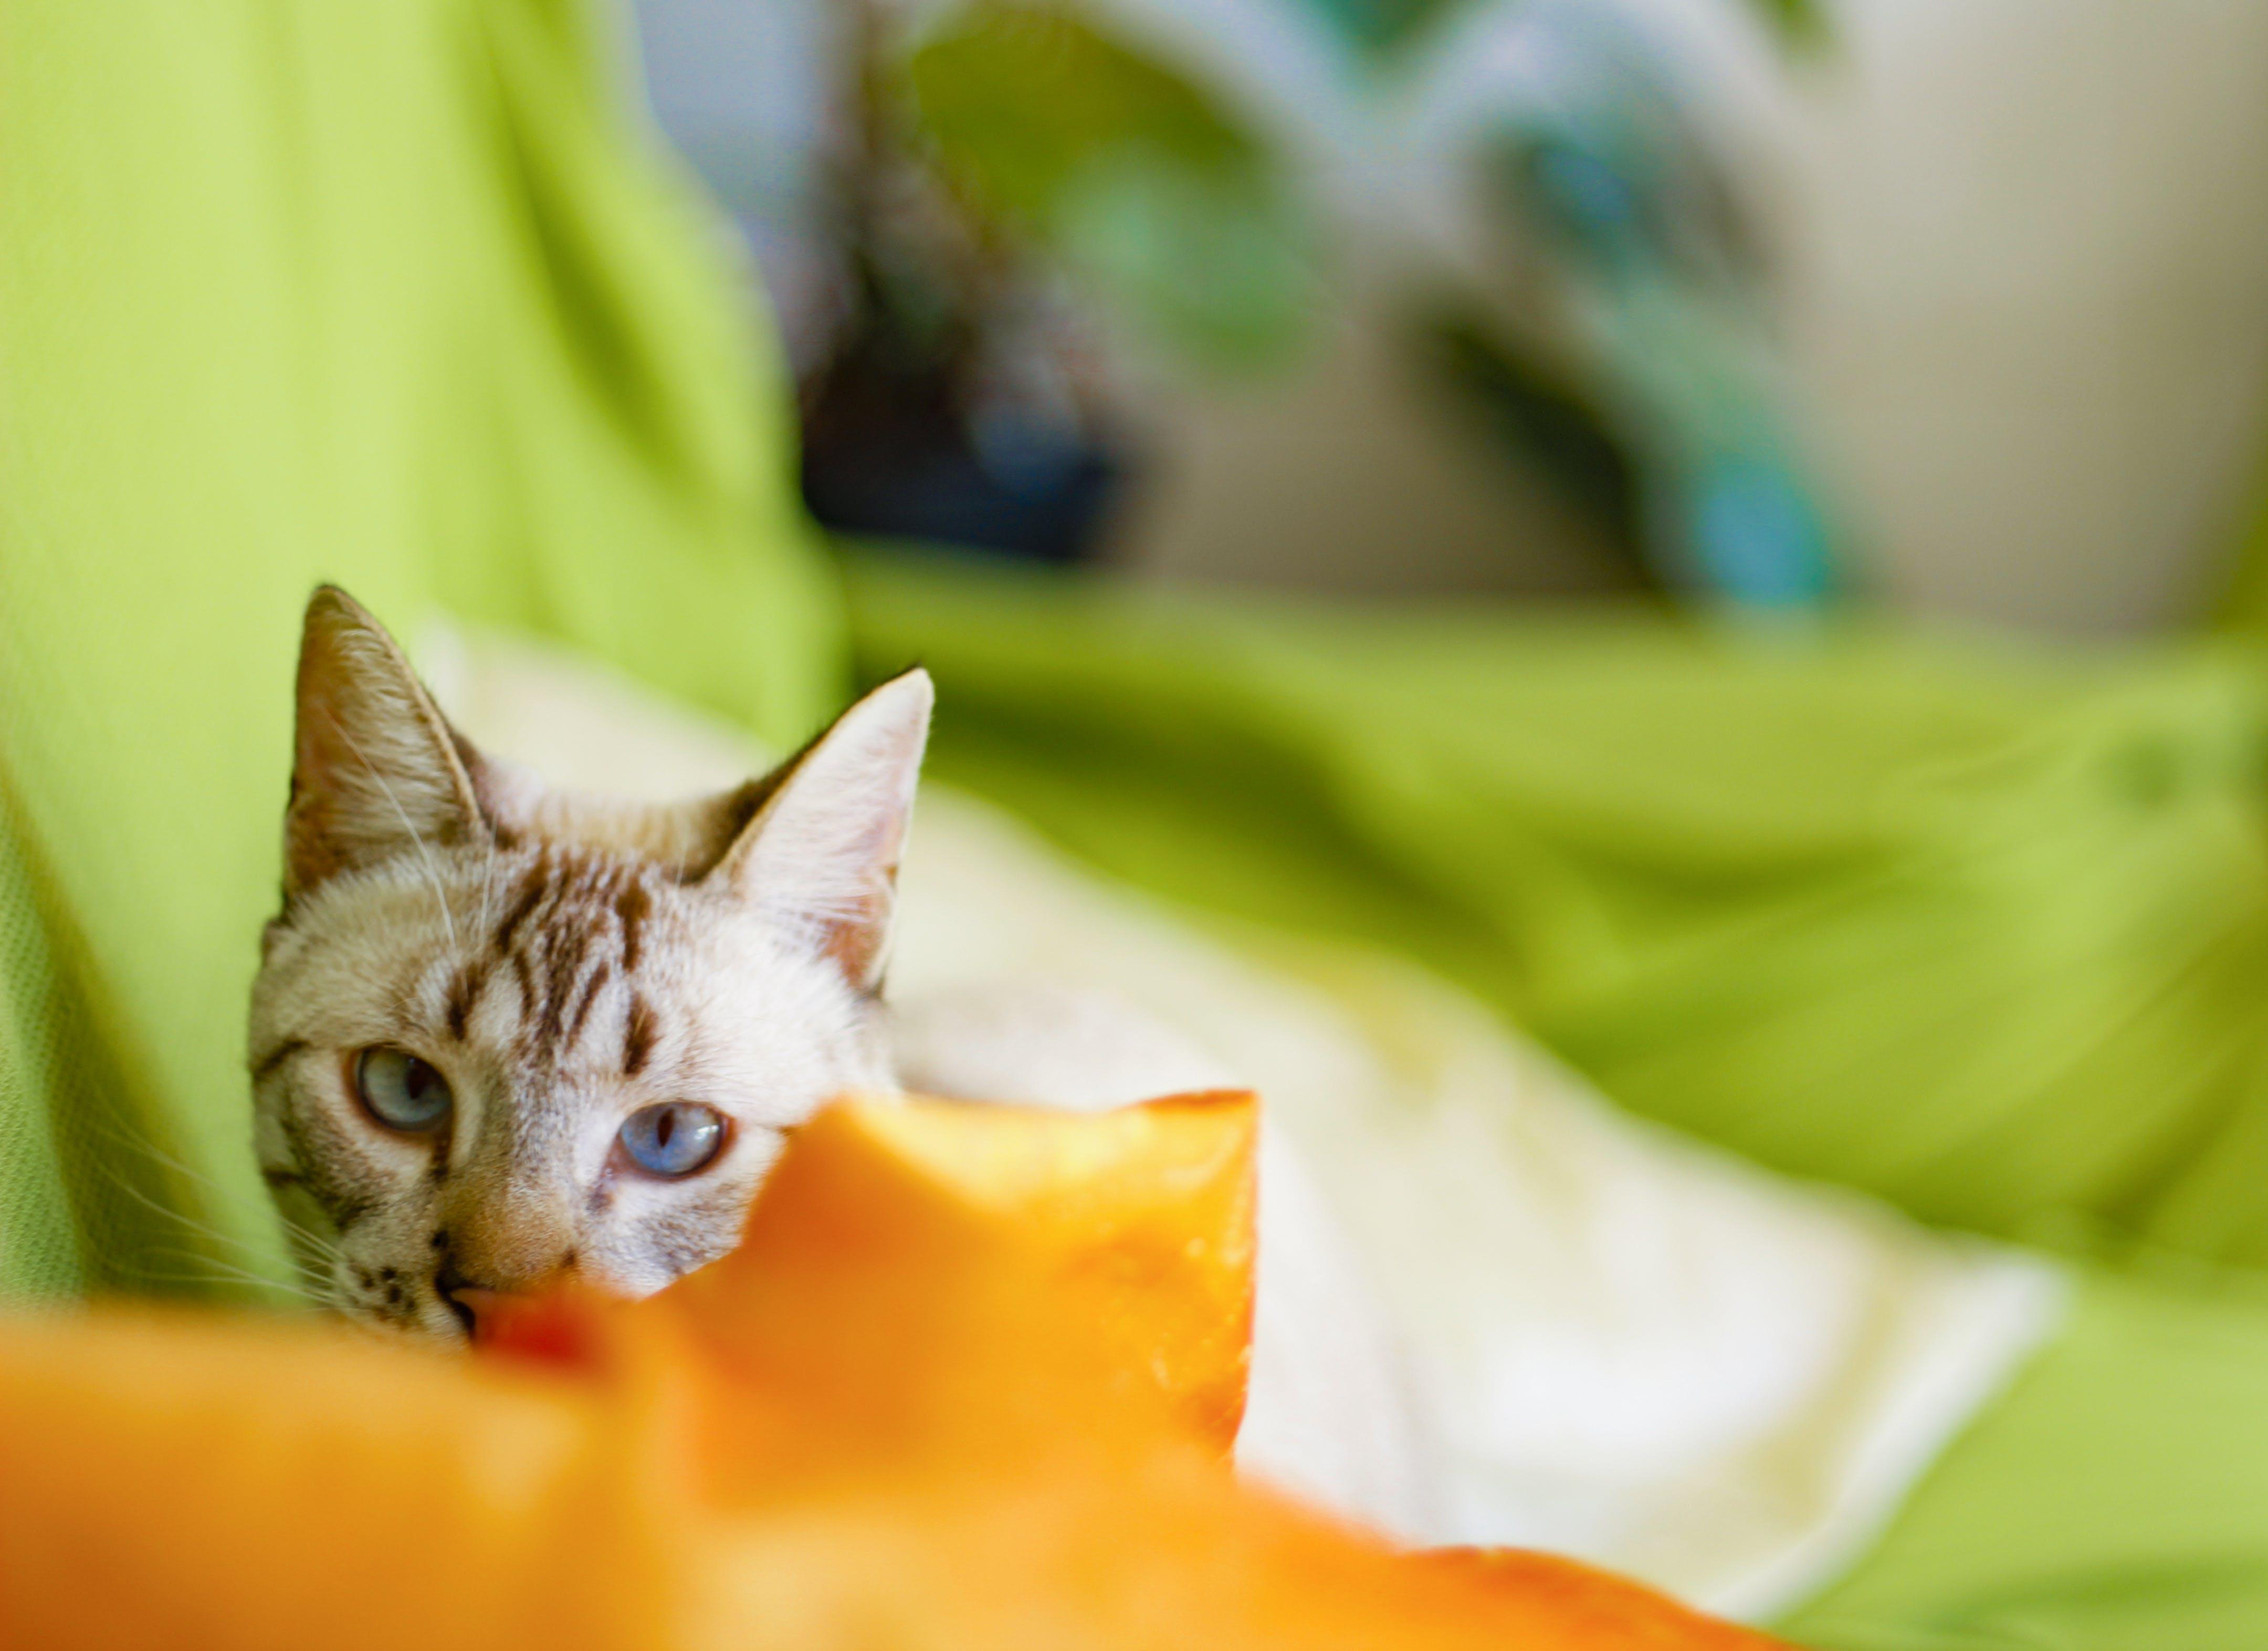 Free stock photo of #cat, #pet, #kitty, #petlover